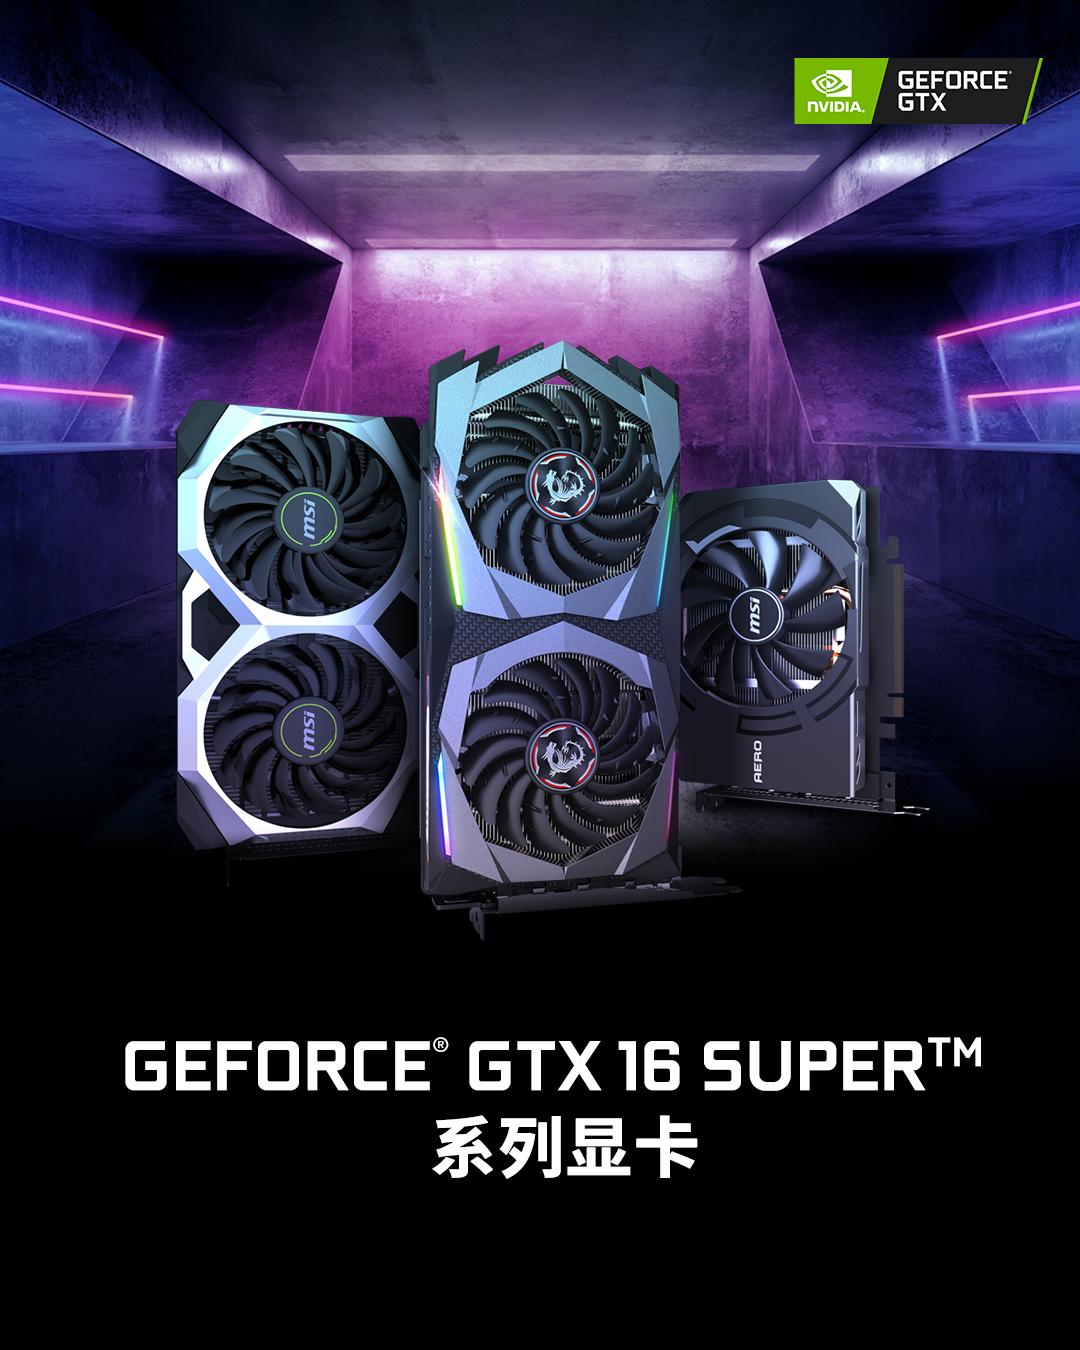 GTX 16 SUPER系列显卡